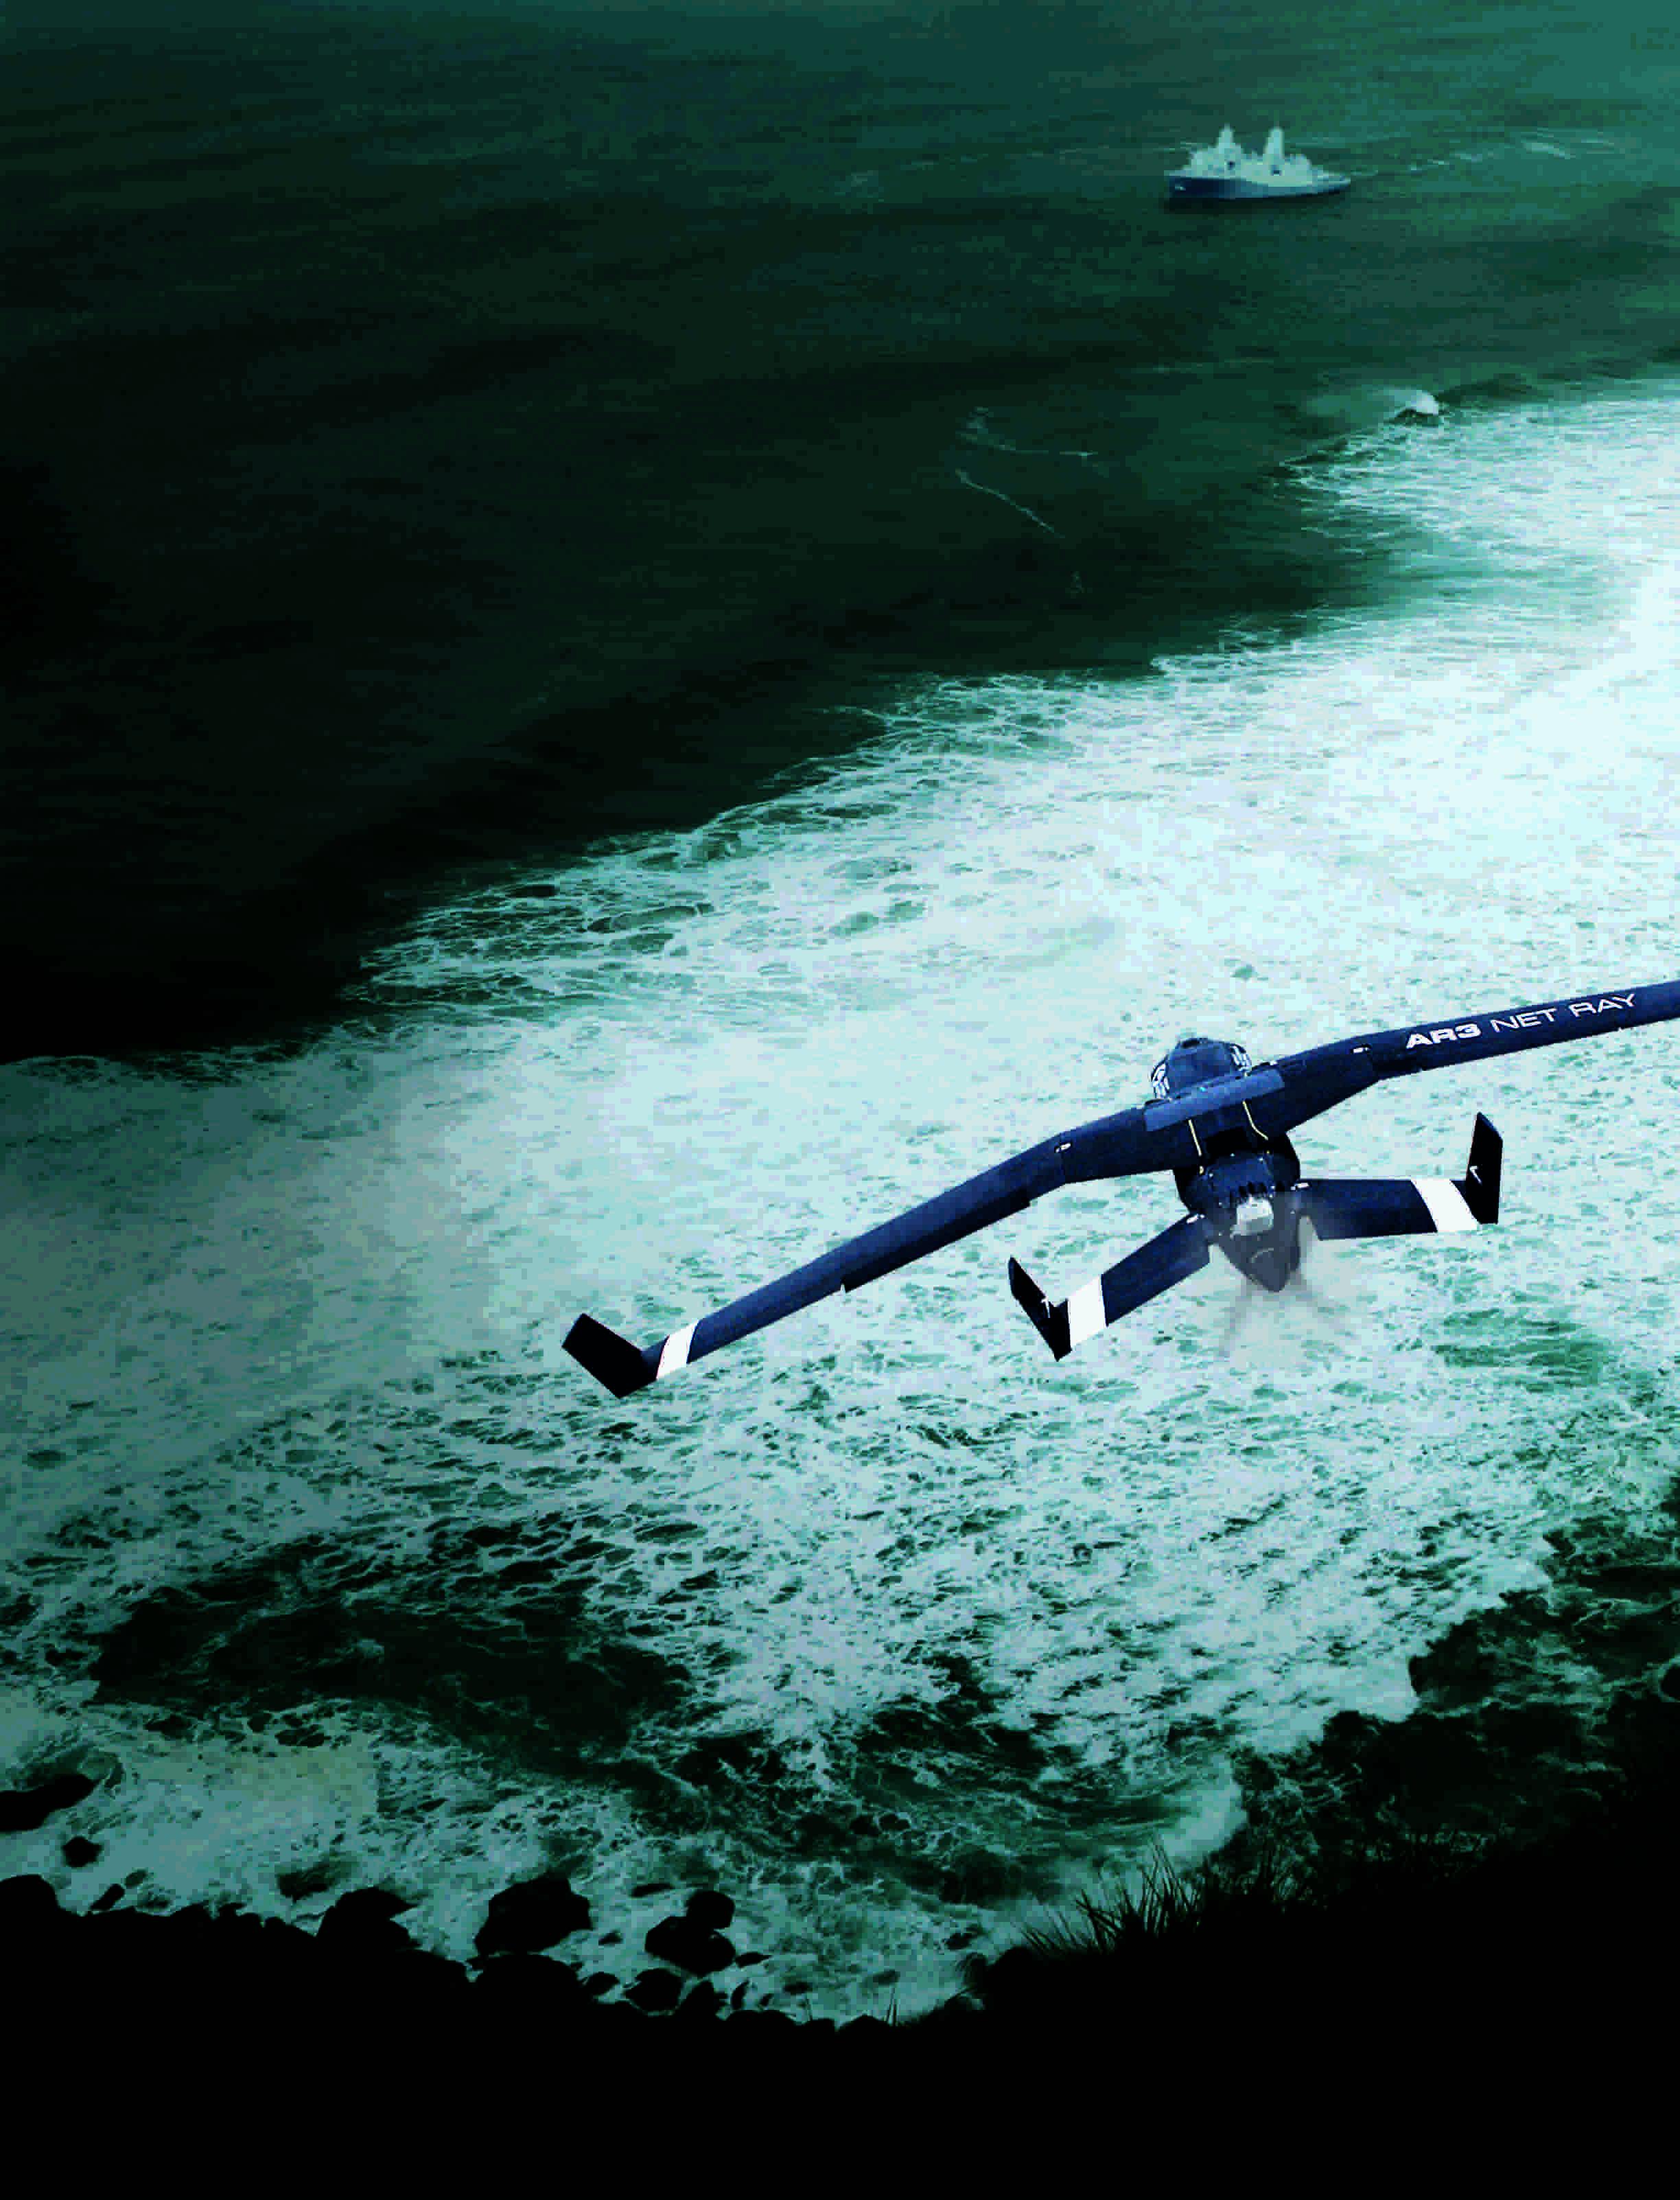 drones cls tekever